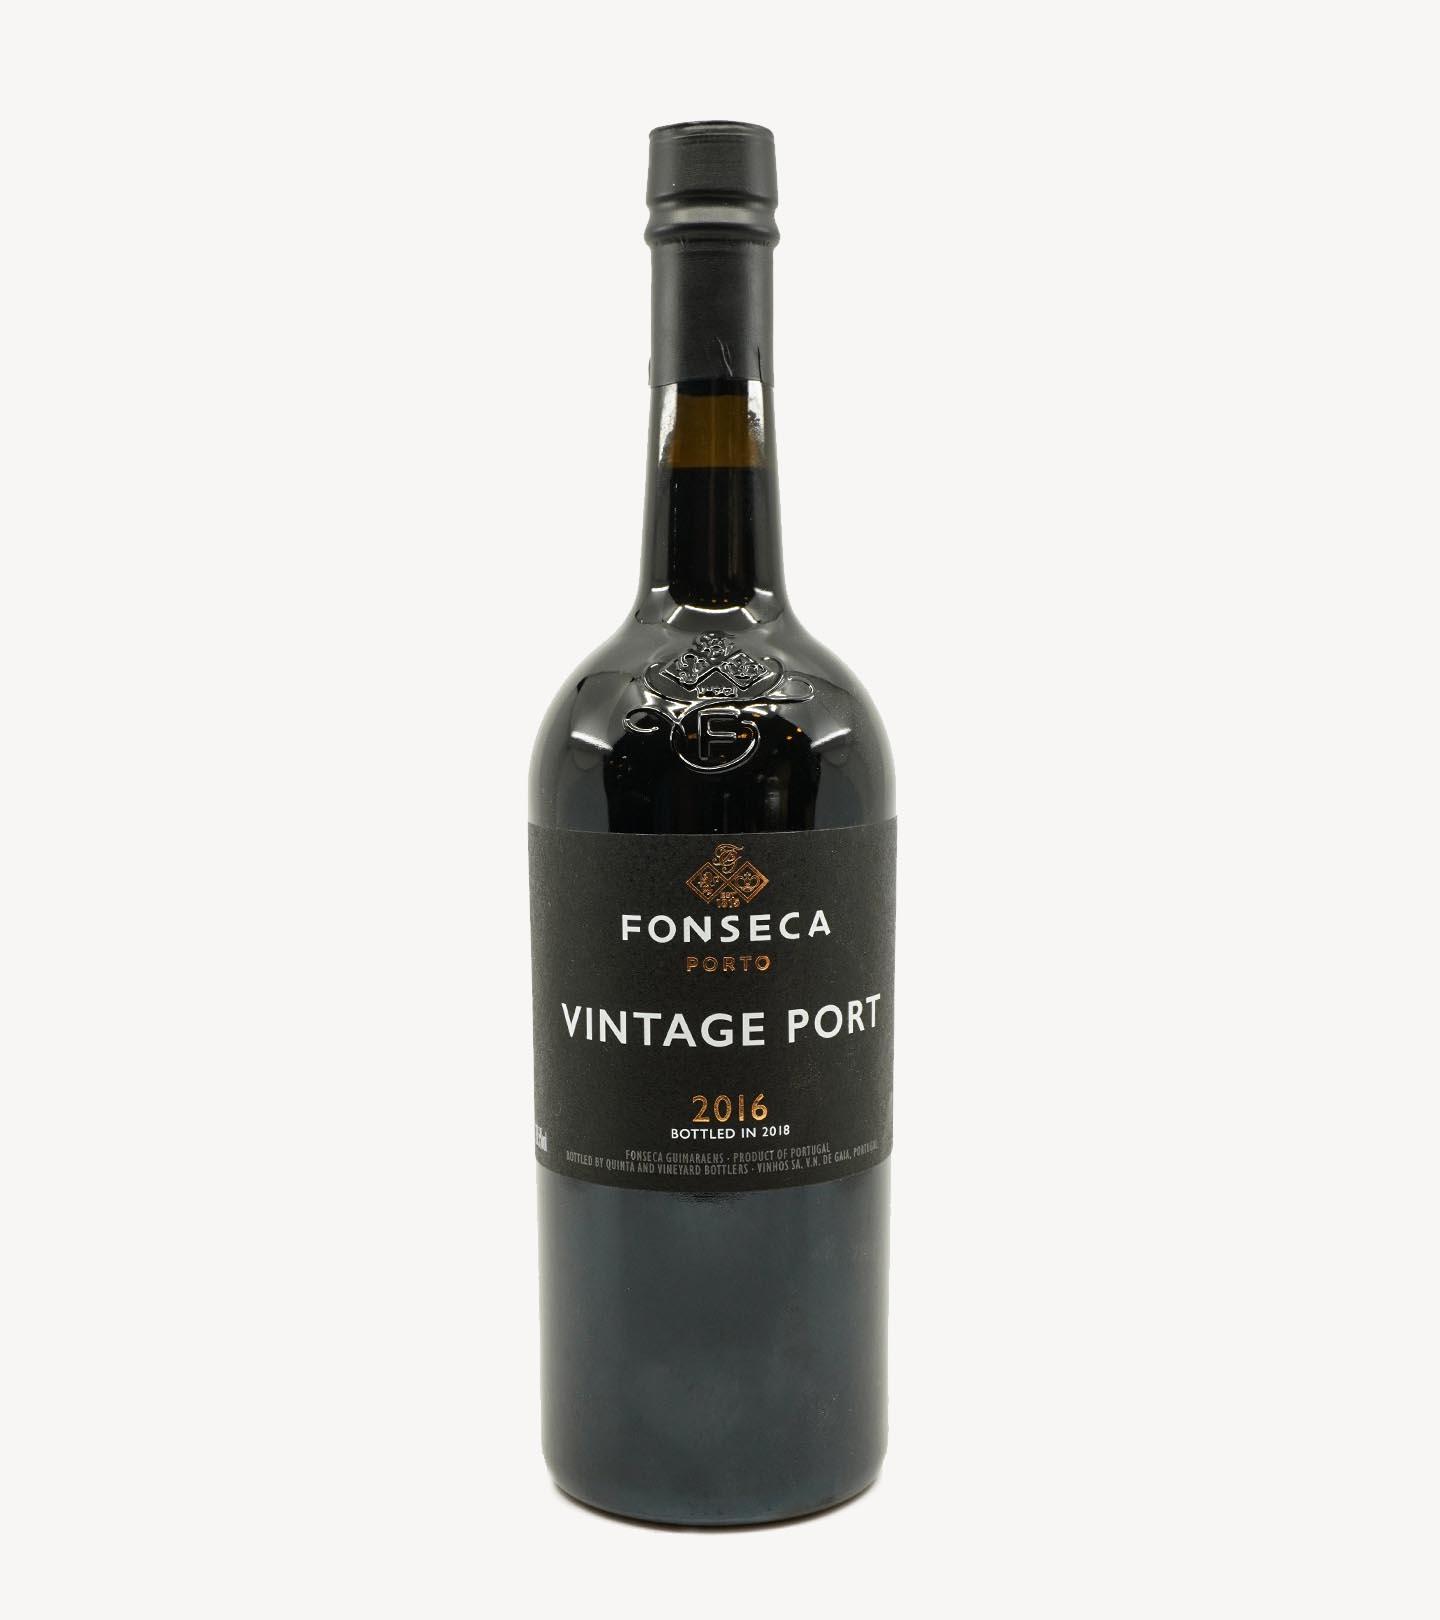 Vinho do Porto Fonseca Vintage 2016 75cl